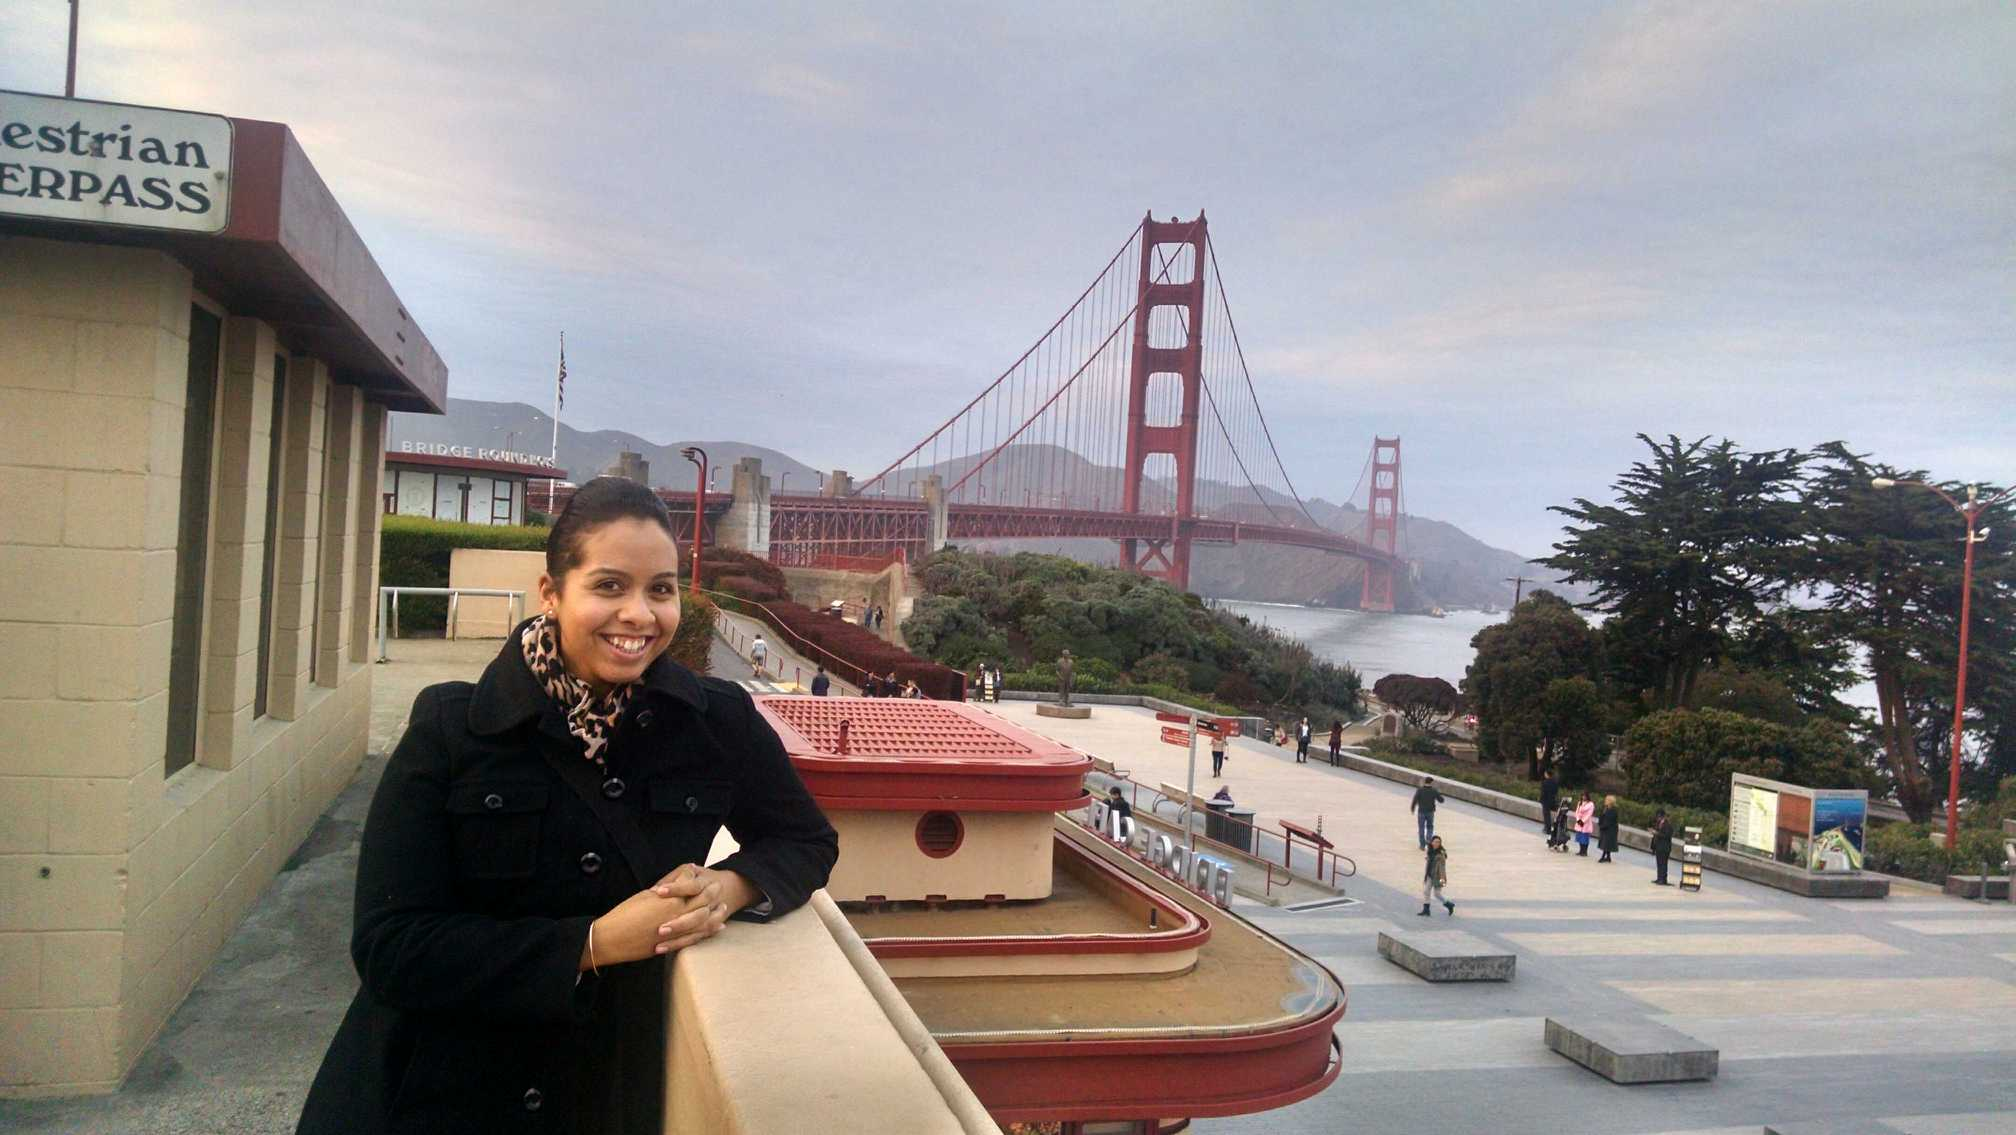 FEATURED MULTIRACIAL INDIVIDUAL: MEET JOANNA THOMPSON via Swirl Nation Blog